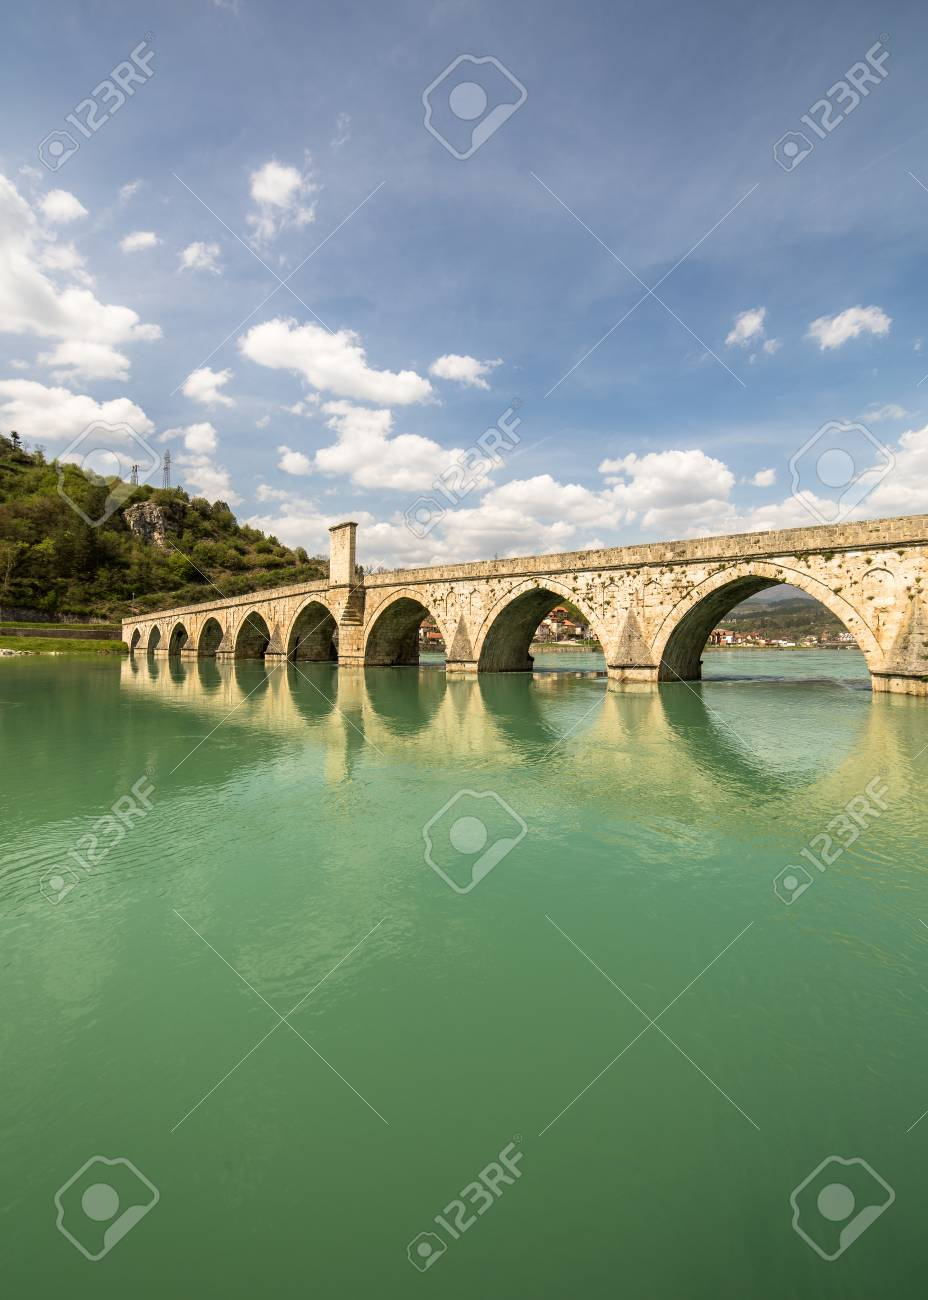 Mehmed Pasa Sokolovic Bridge in Visegrad on Drina River - 125698498